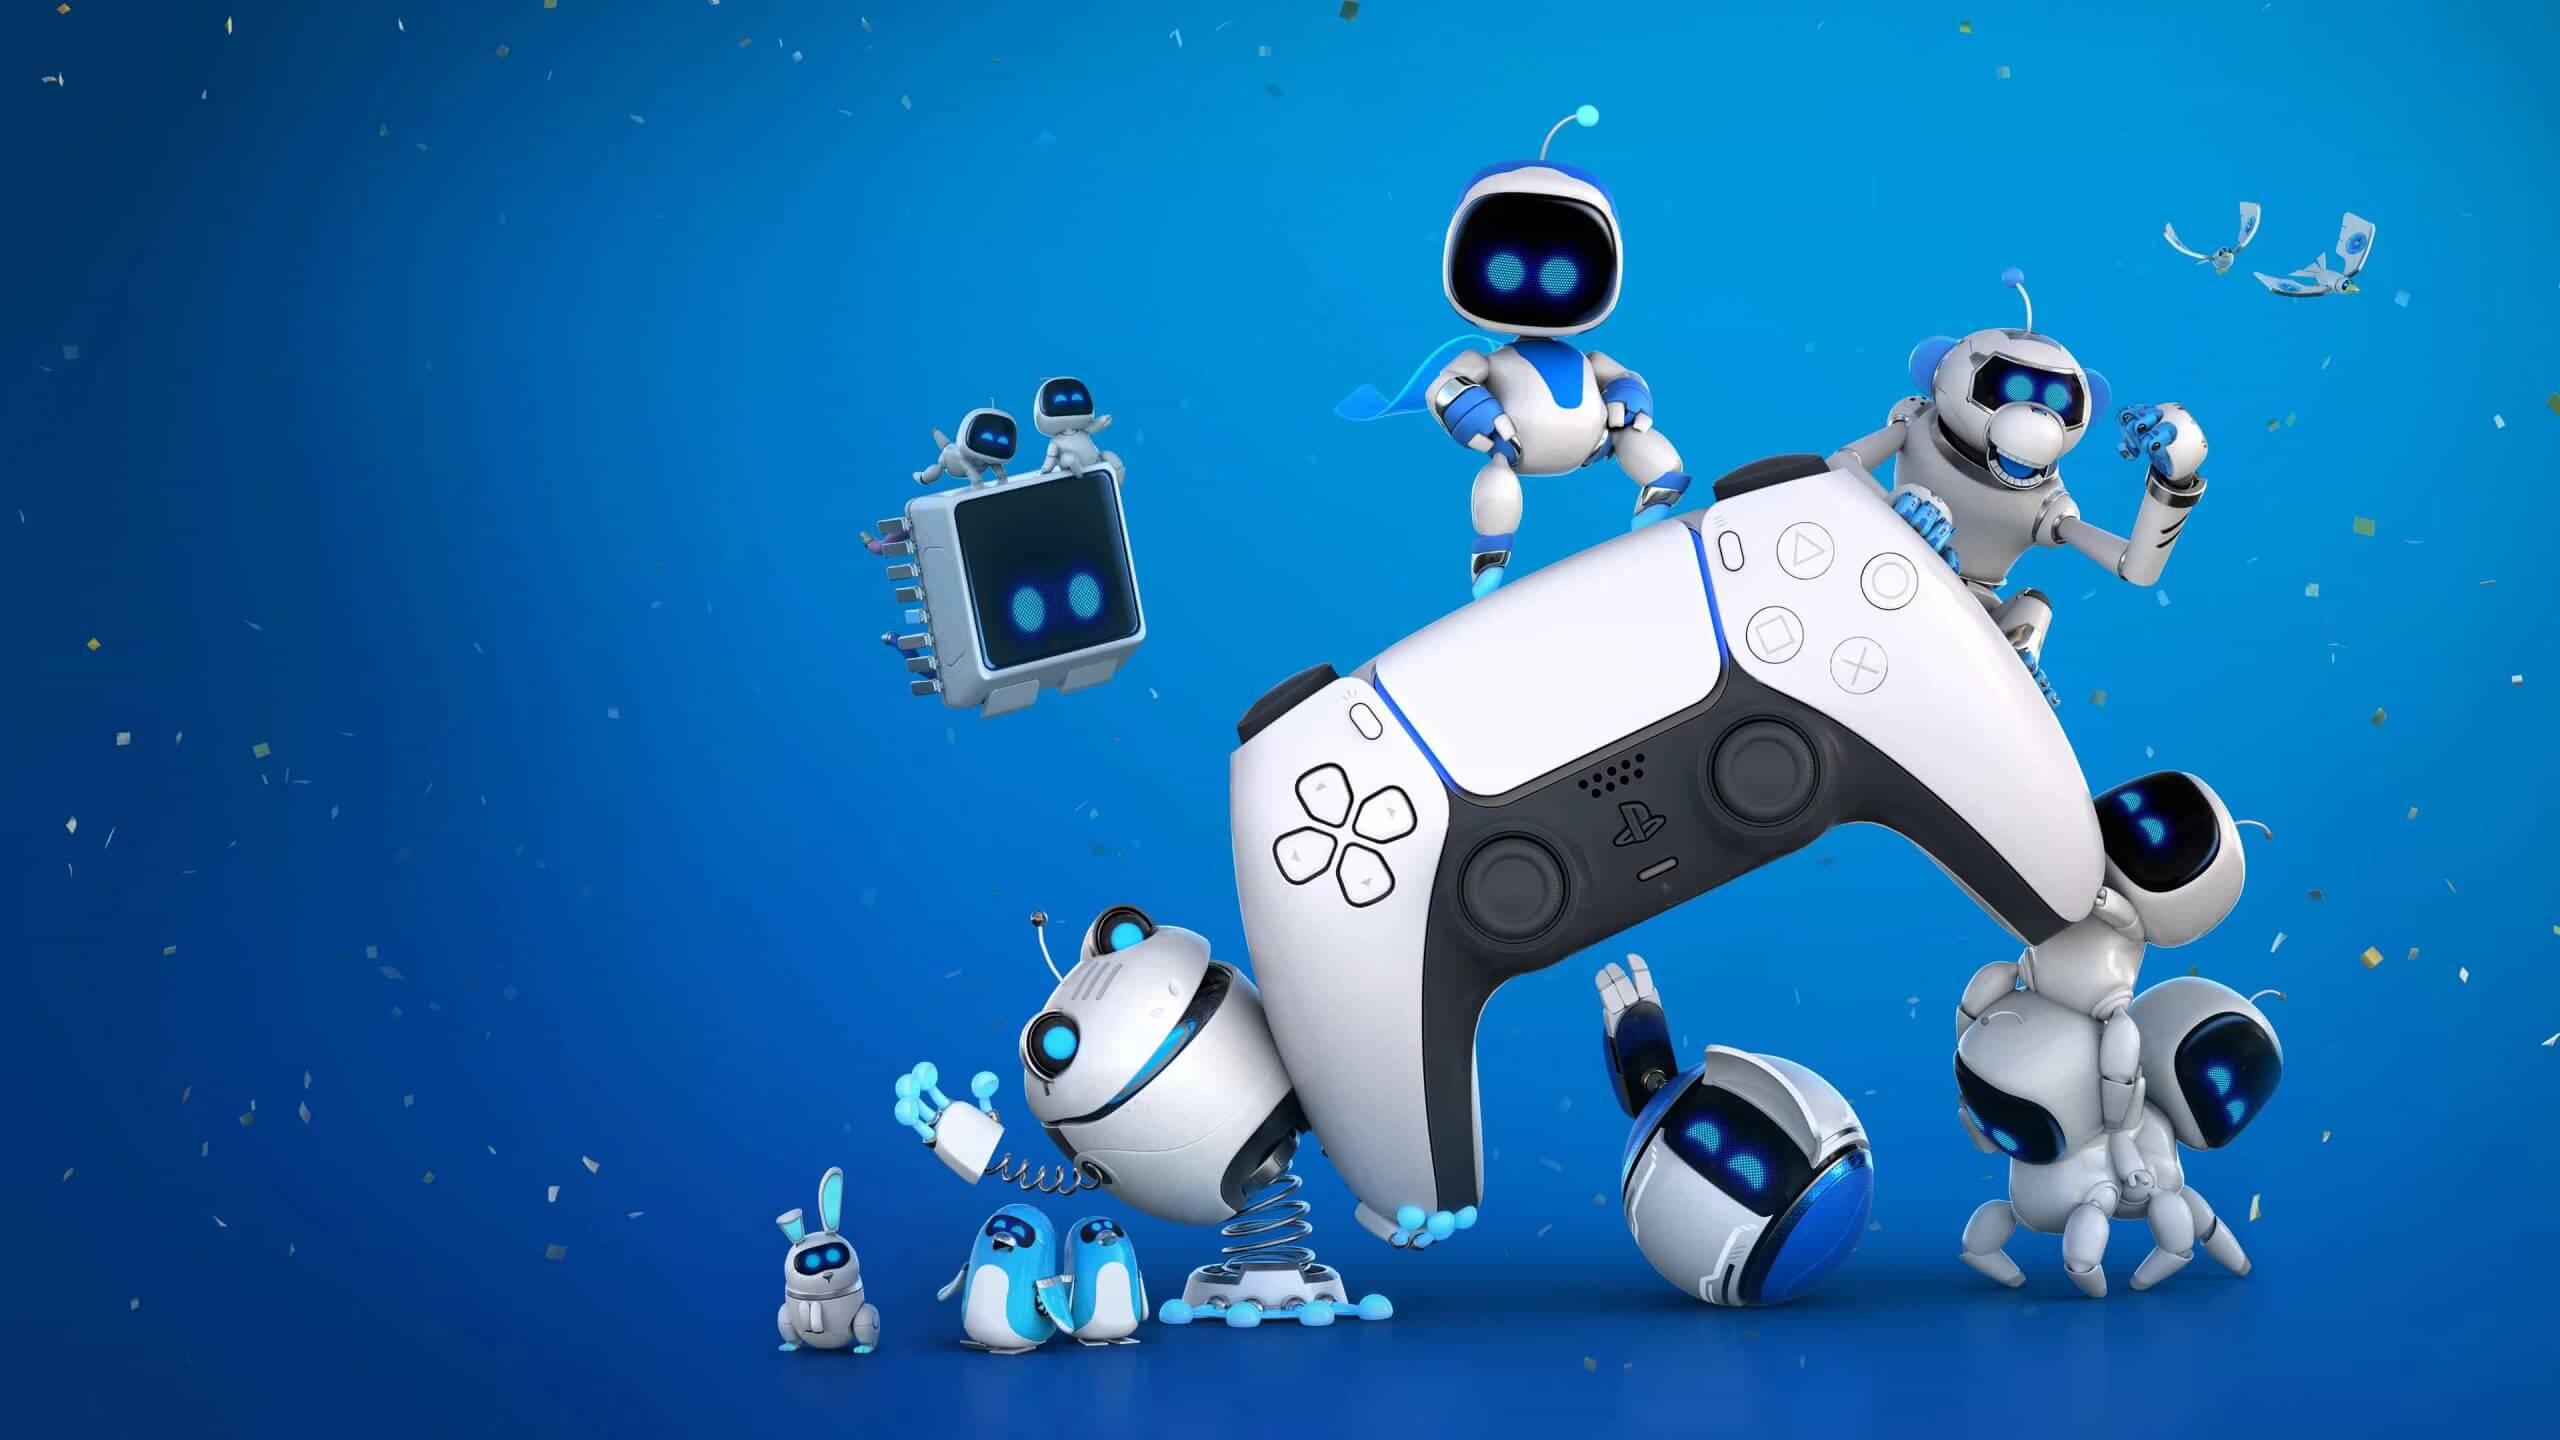 ps5 control an robots